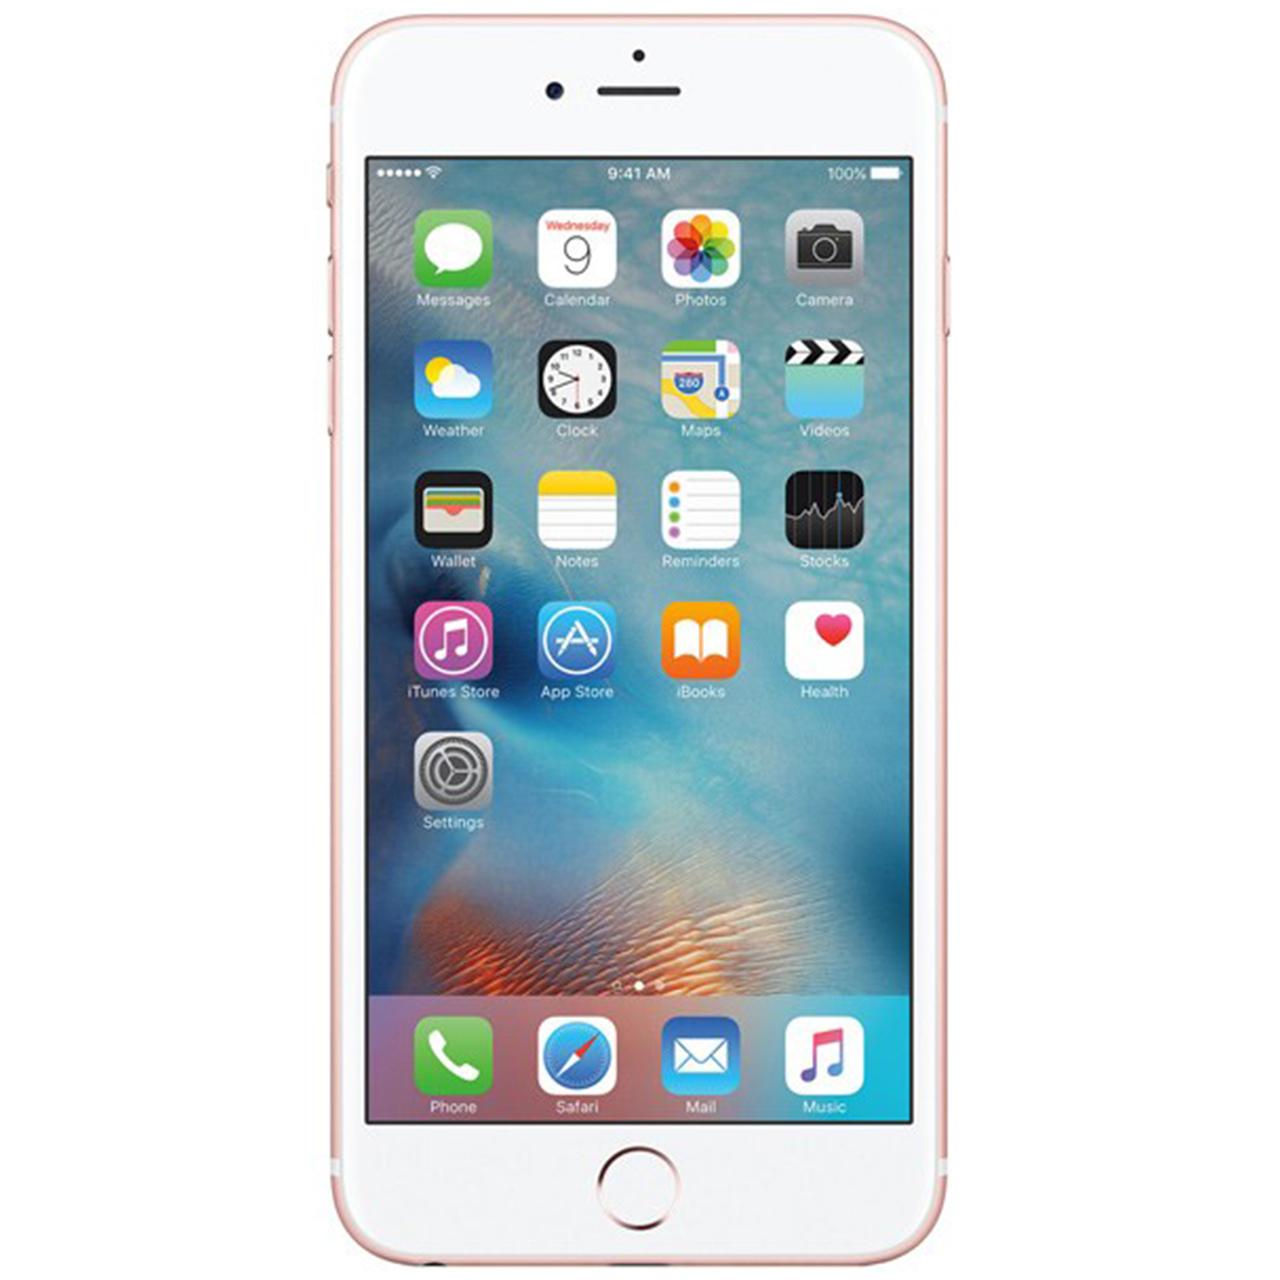 گوشی موبایل اپل مدل iPhone 6s Plus - ظرفیت 64 گیگابایت                             Apple iPhone 6s Plus 64GB Mobile Phone